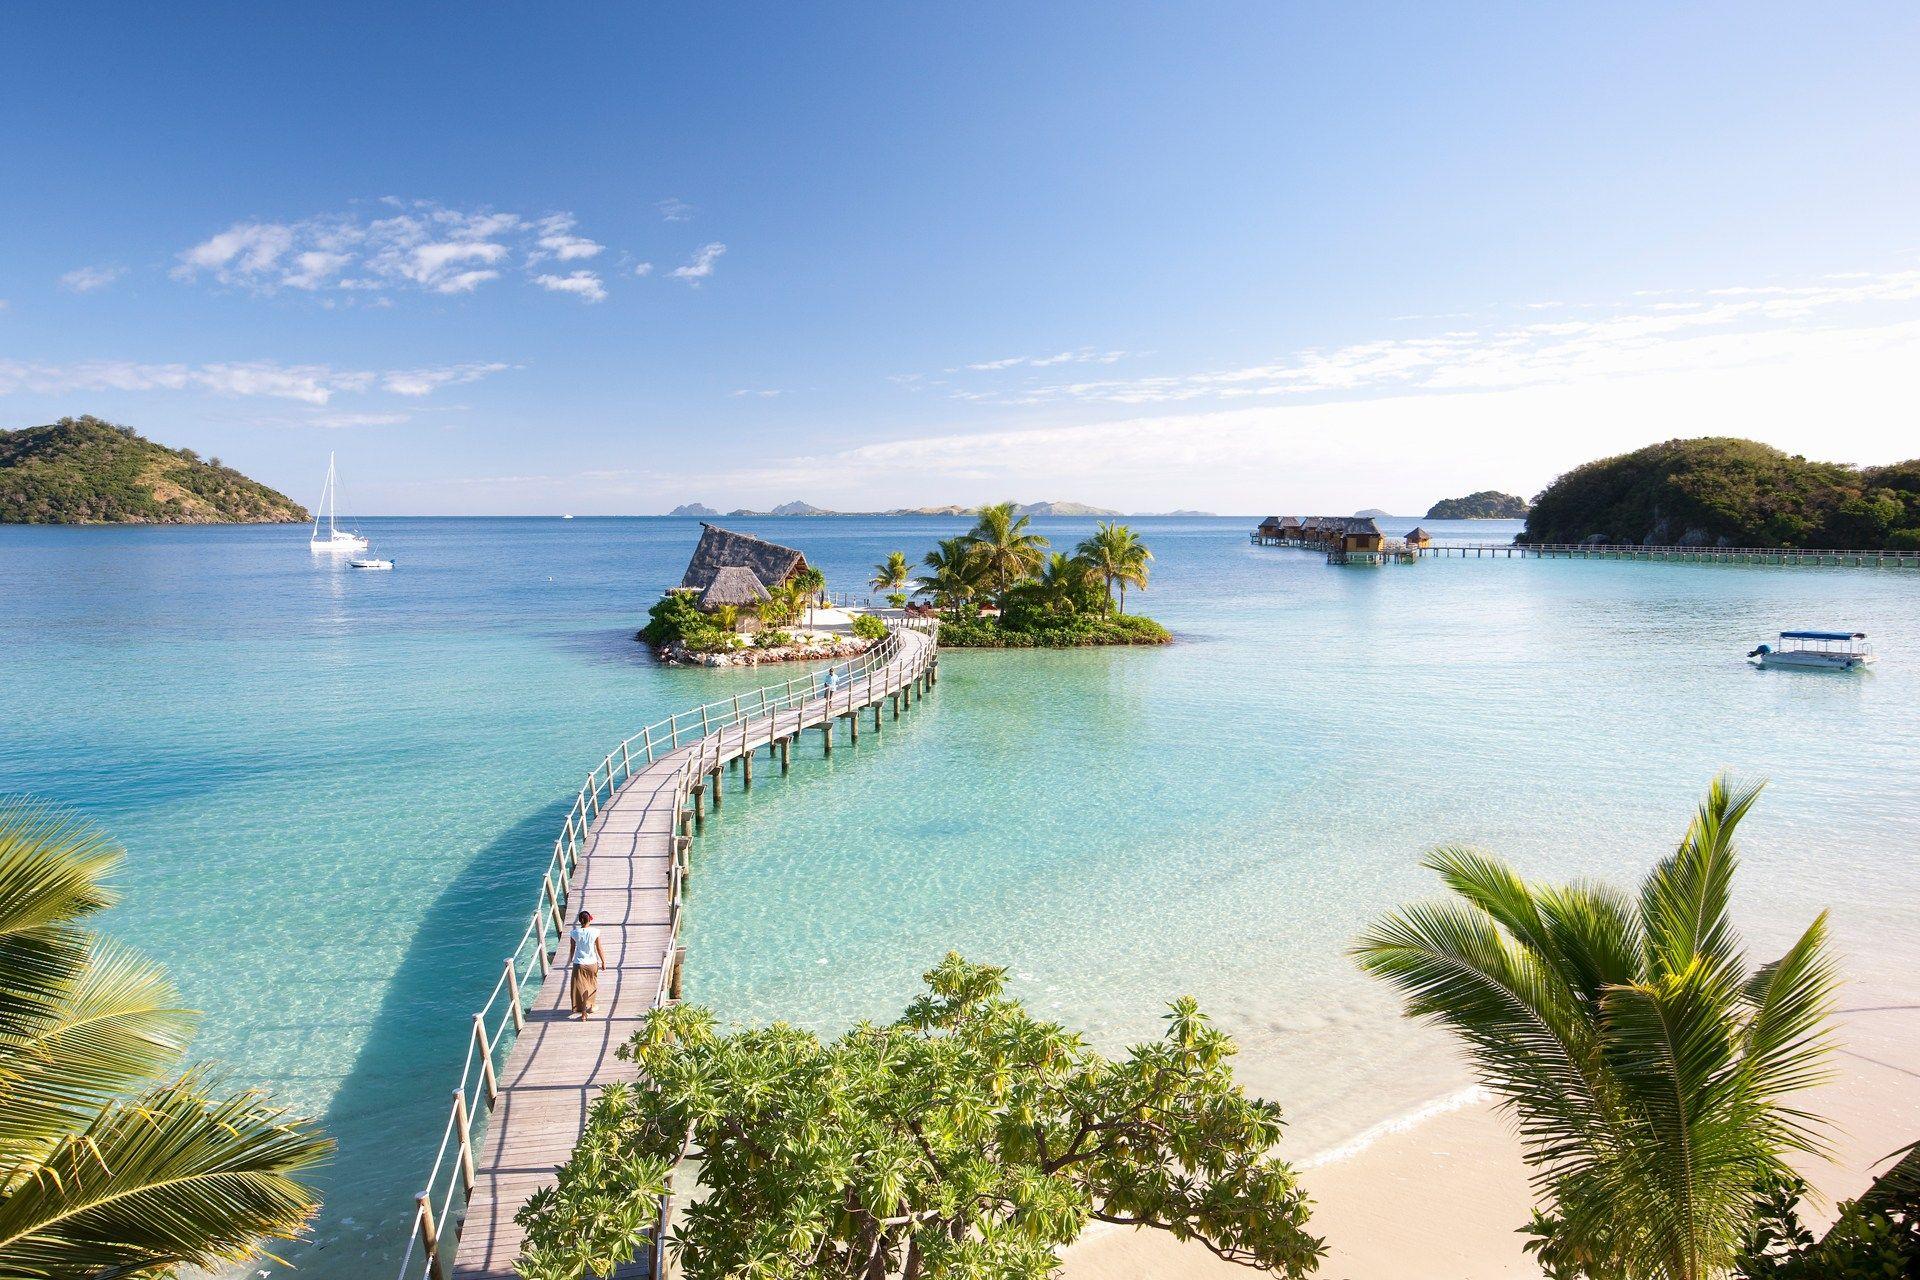 The Blue Lagoon Beach Resort Fiji S Serene Paradise